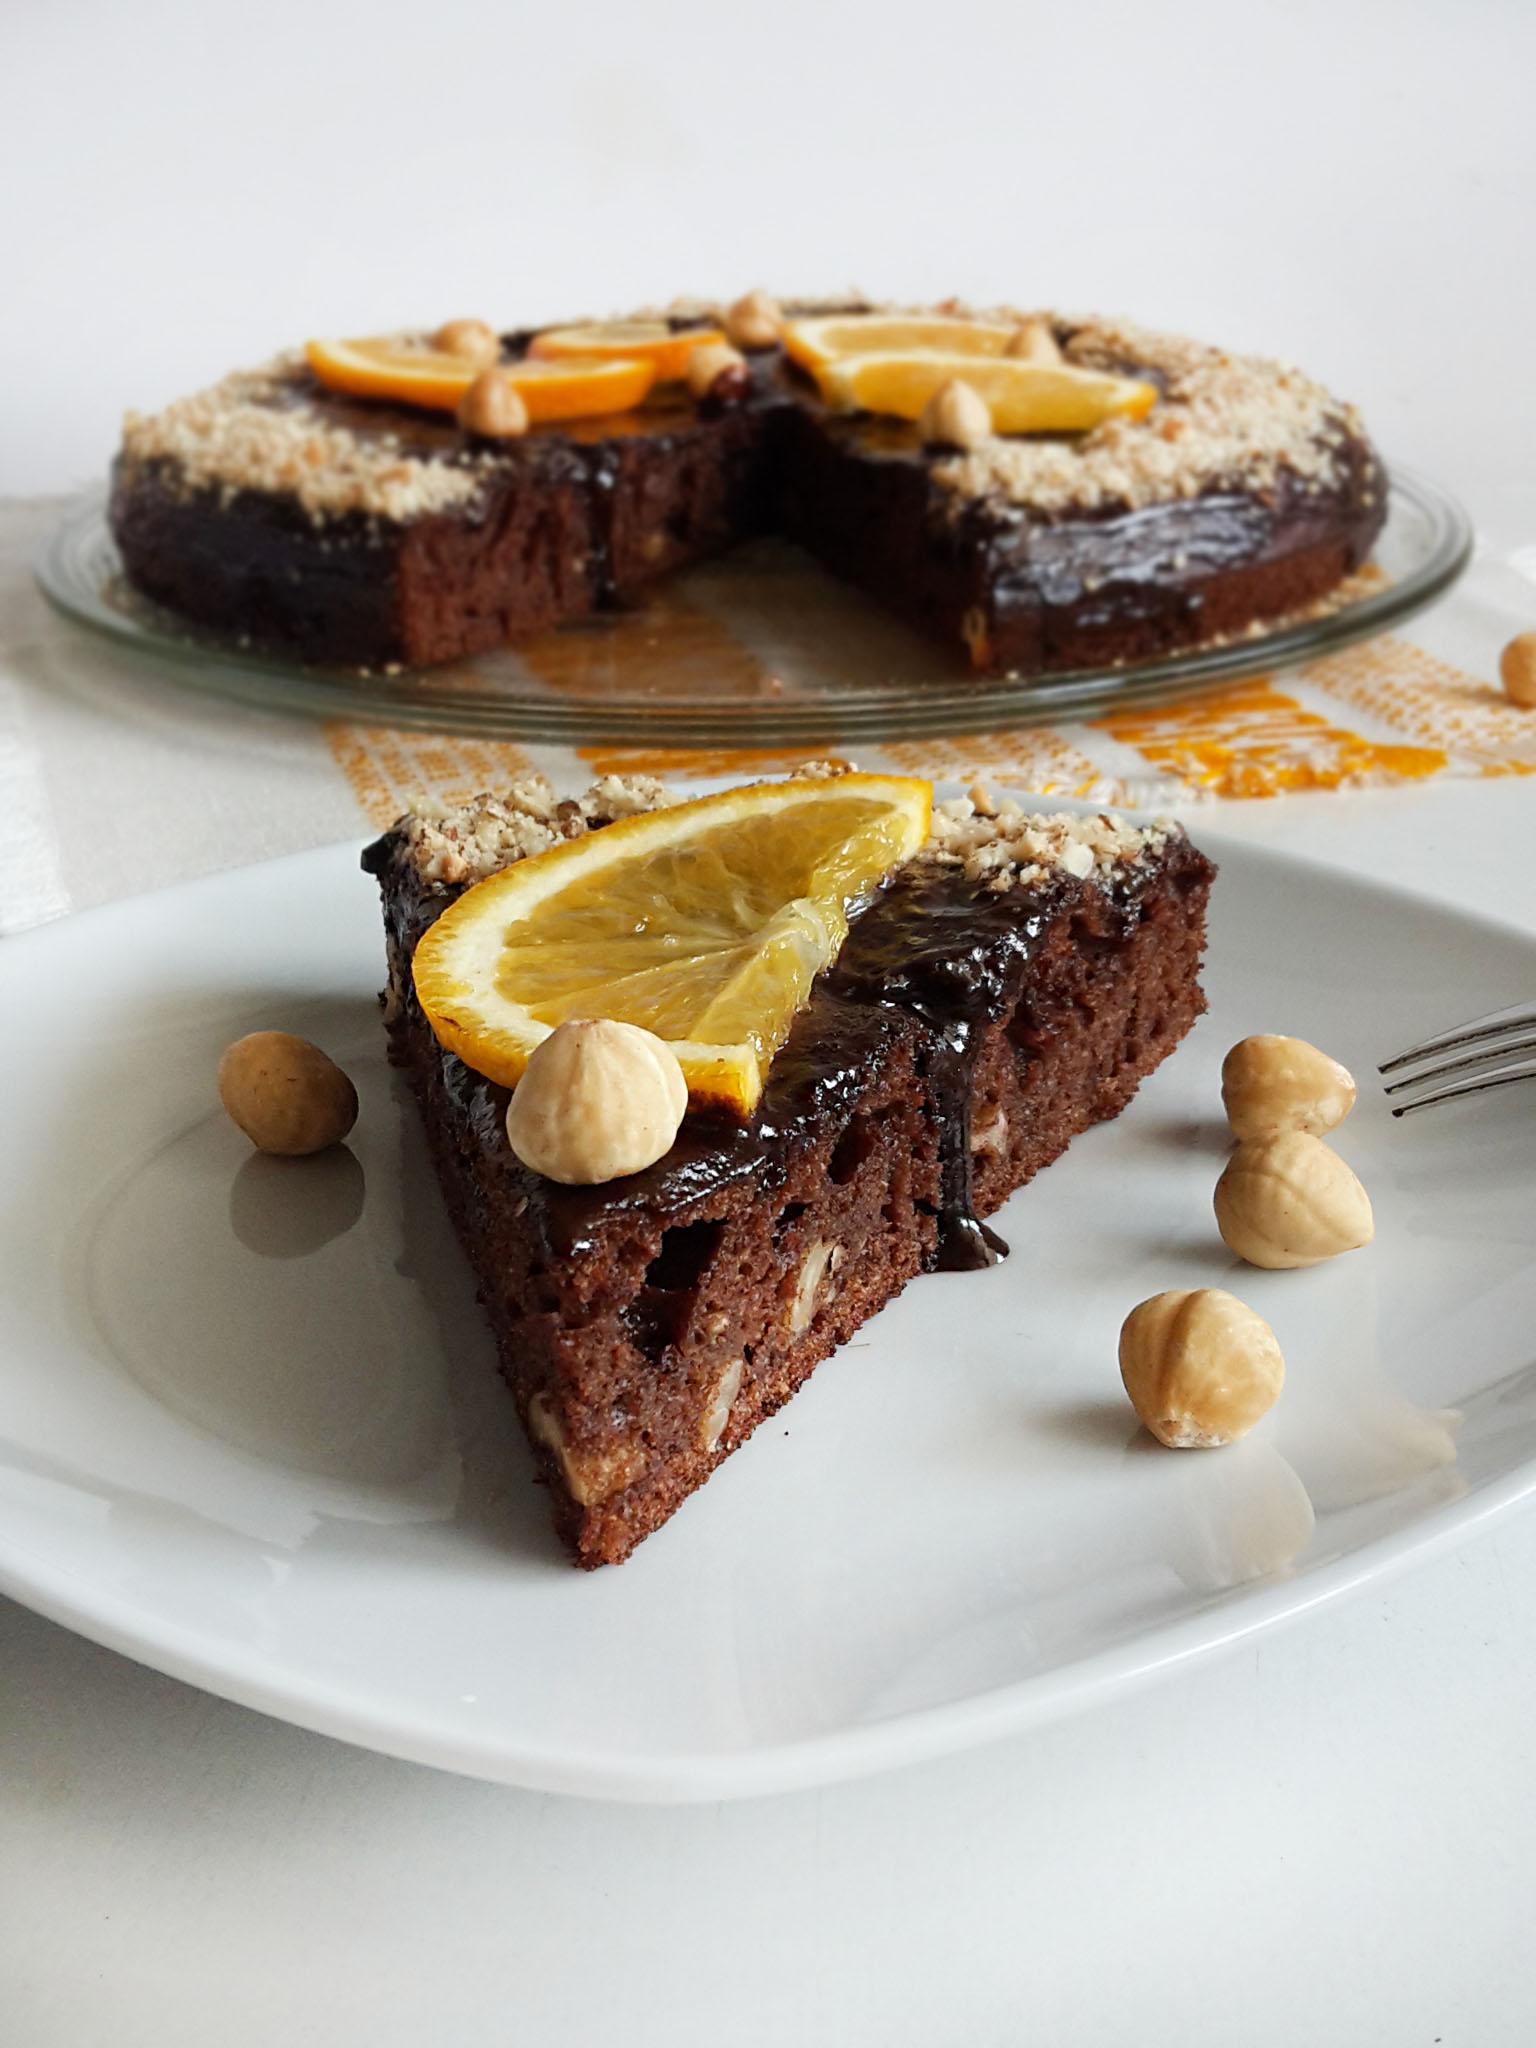 tort cu ciocolata si alune chocolate cake with hazelnuts 3